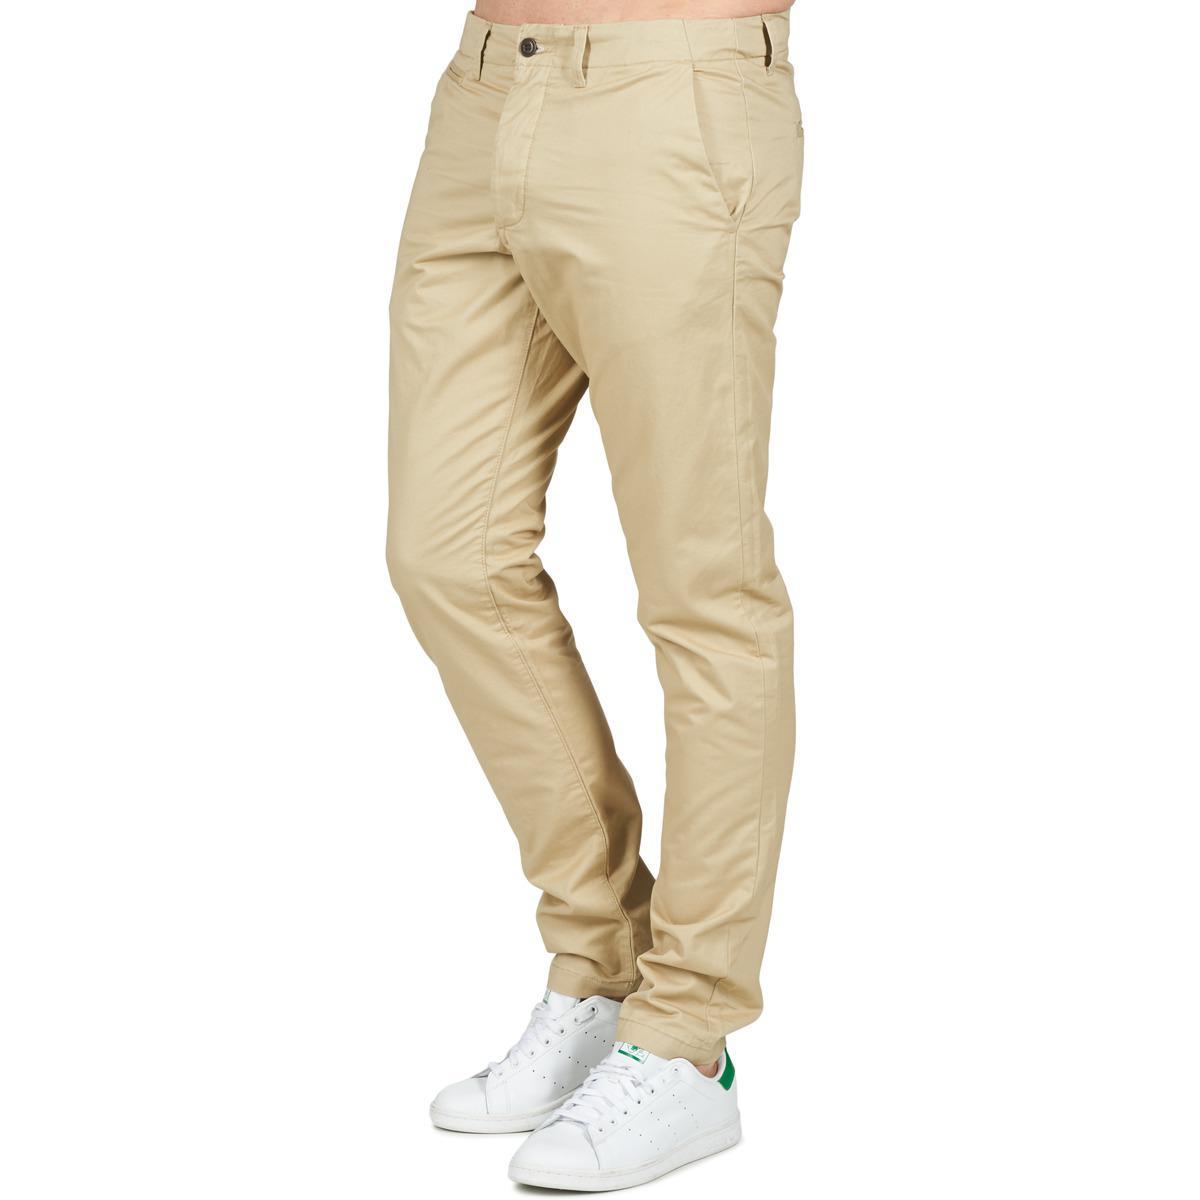 Jack & Jones Denim Cody Jeans Intelligence Trousers in Beige (Natural) for Men